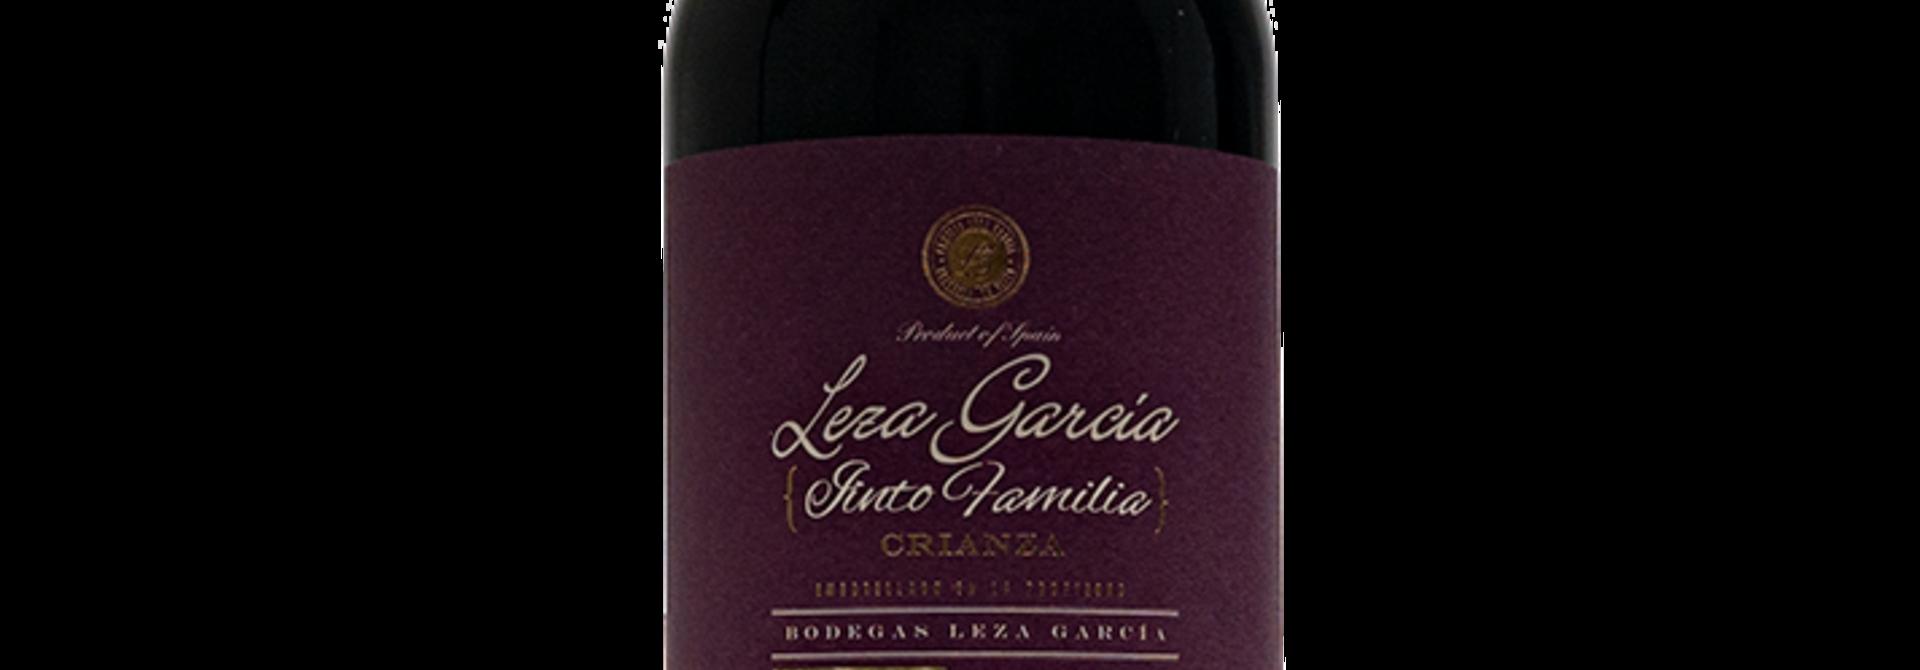 Rioja Crianza Leza Garcia Tinto Familia 2015